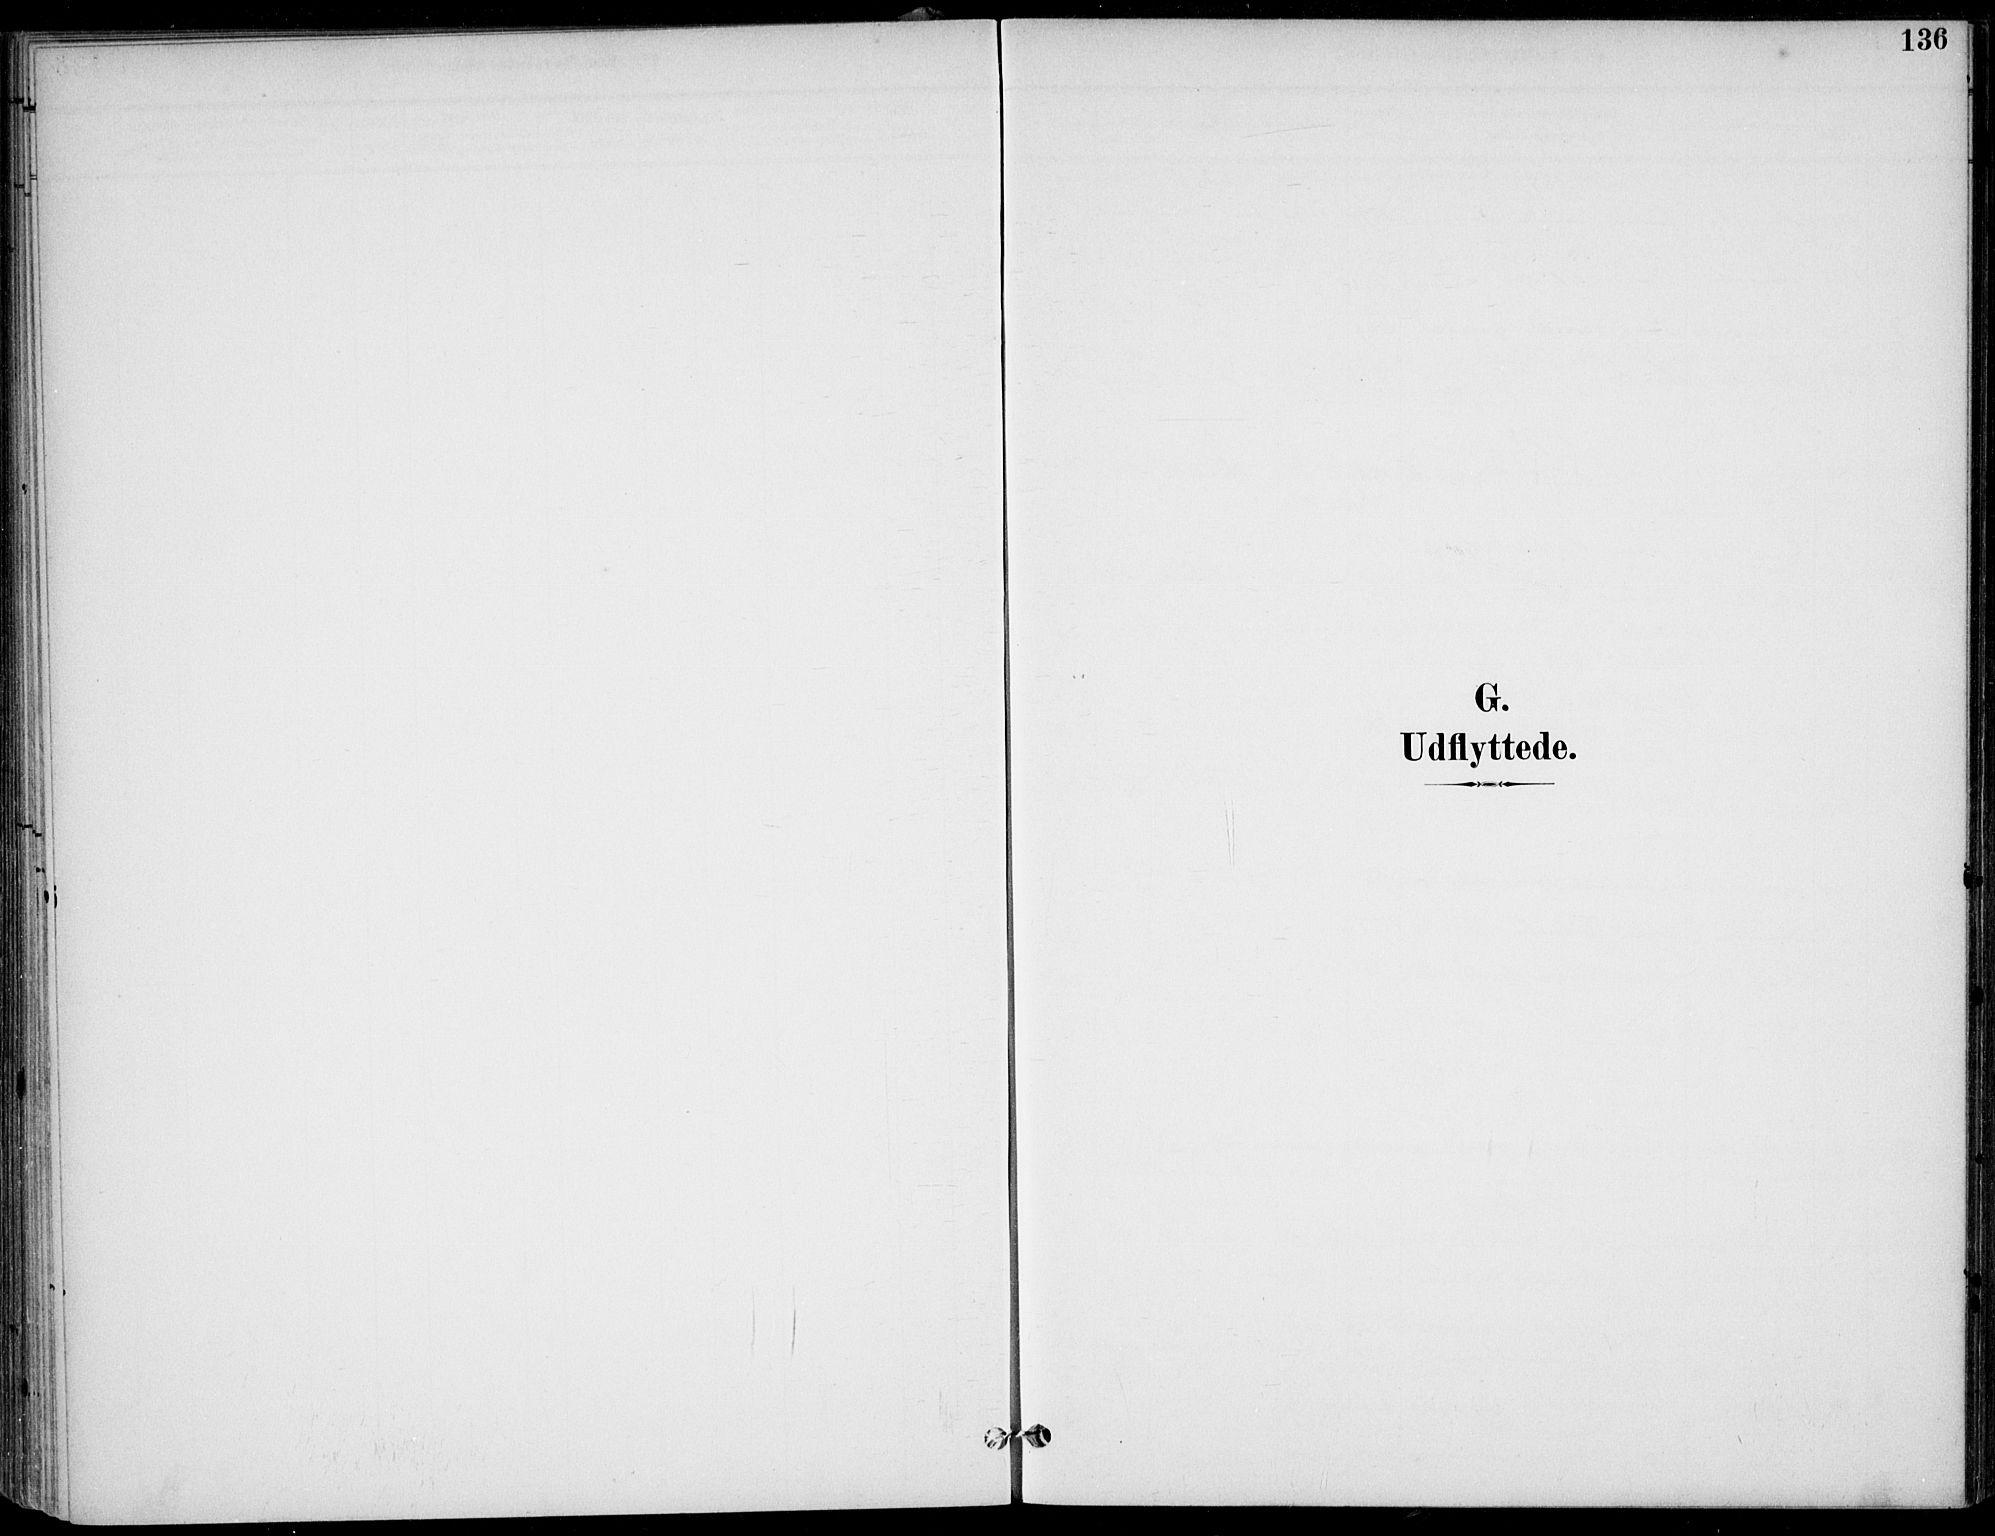 SAKO, Lunde kirkebøker, F/Fa/L0003: Ministerialbok nr. I 3, 1893-1902, s. 136